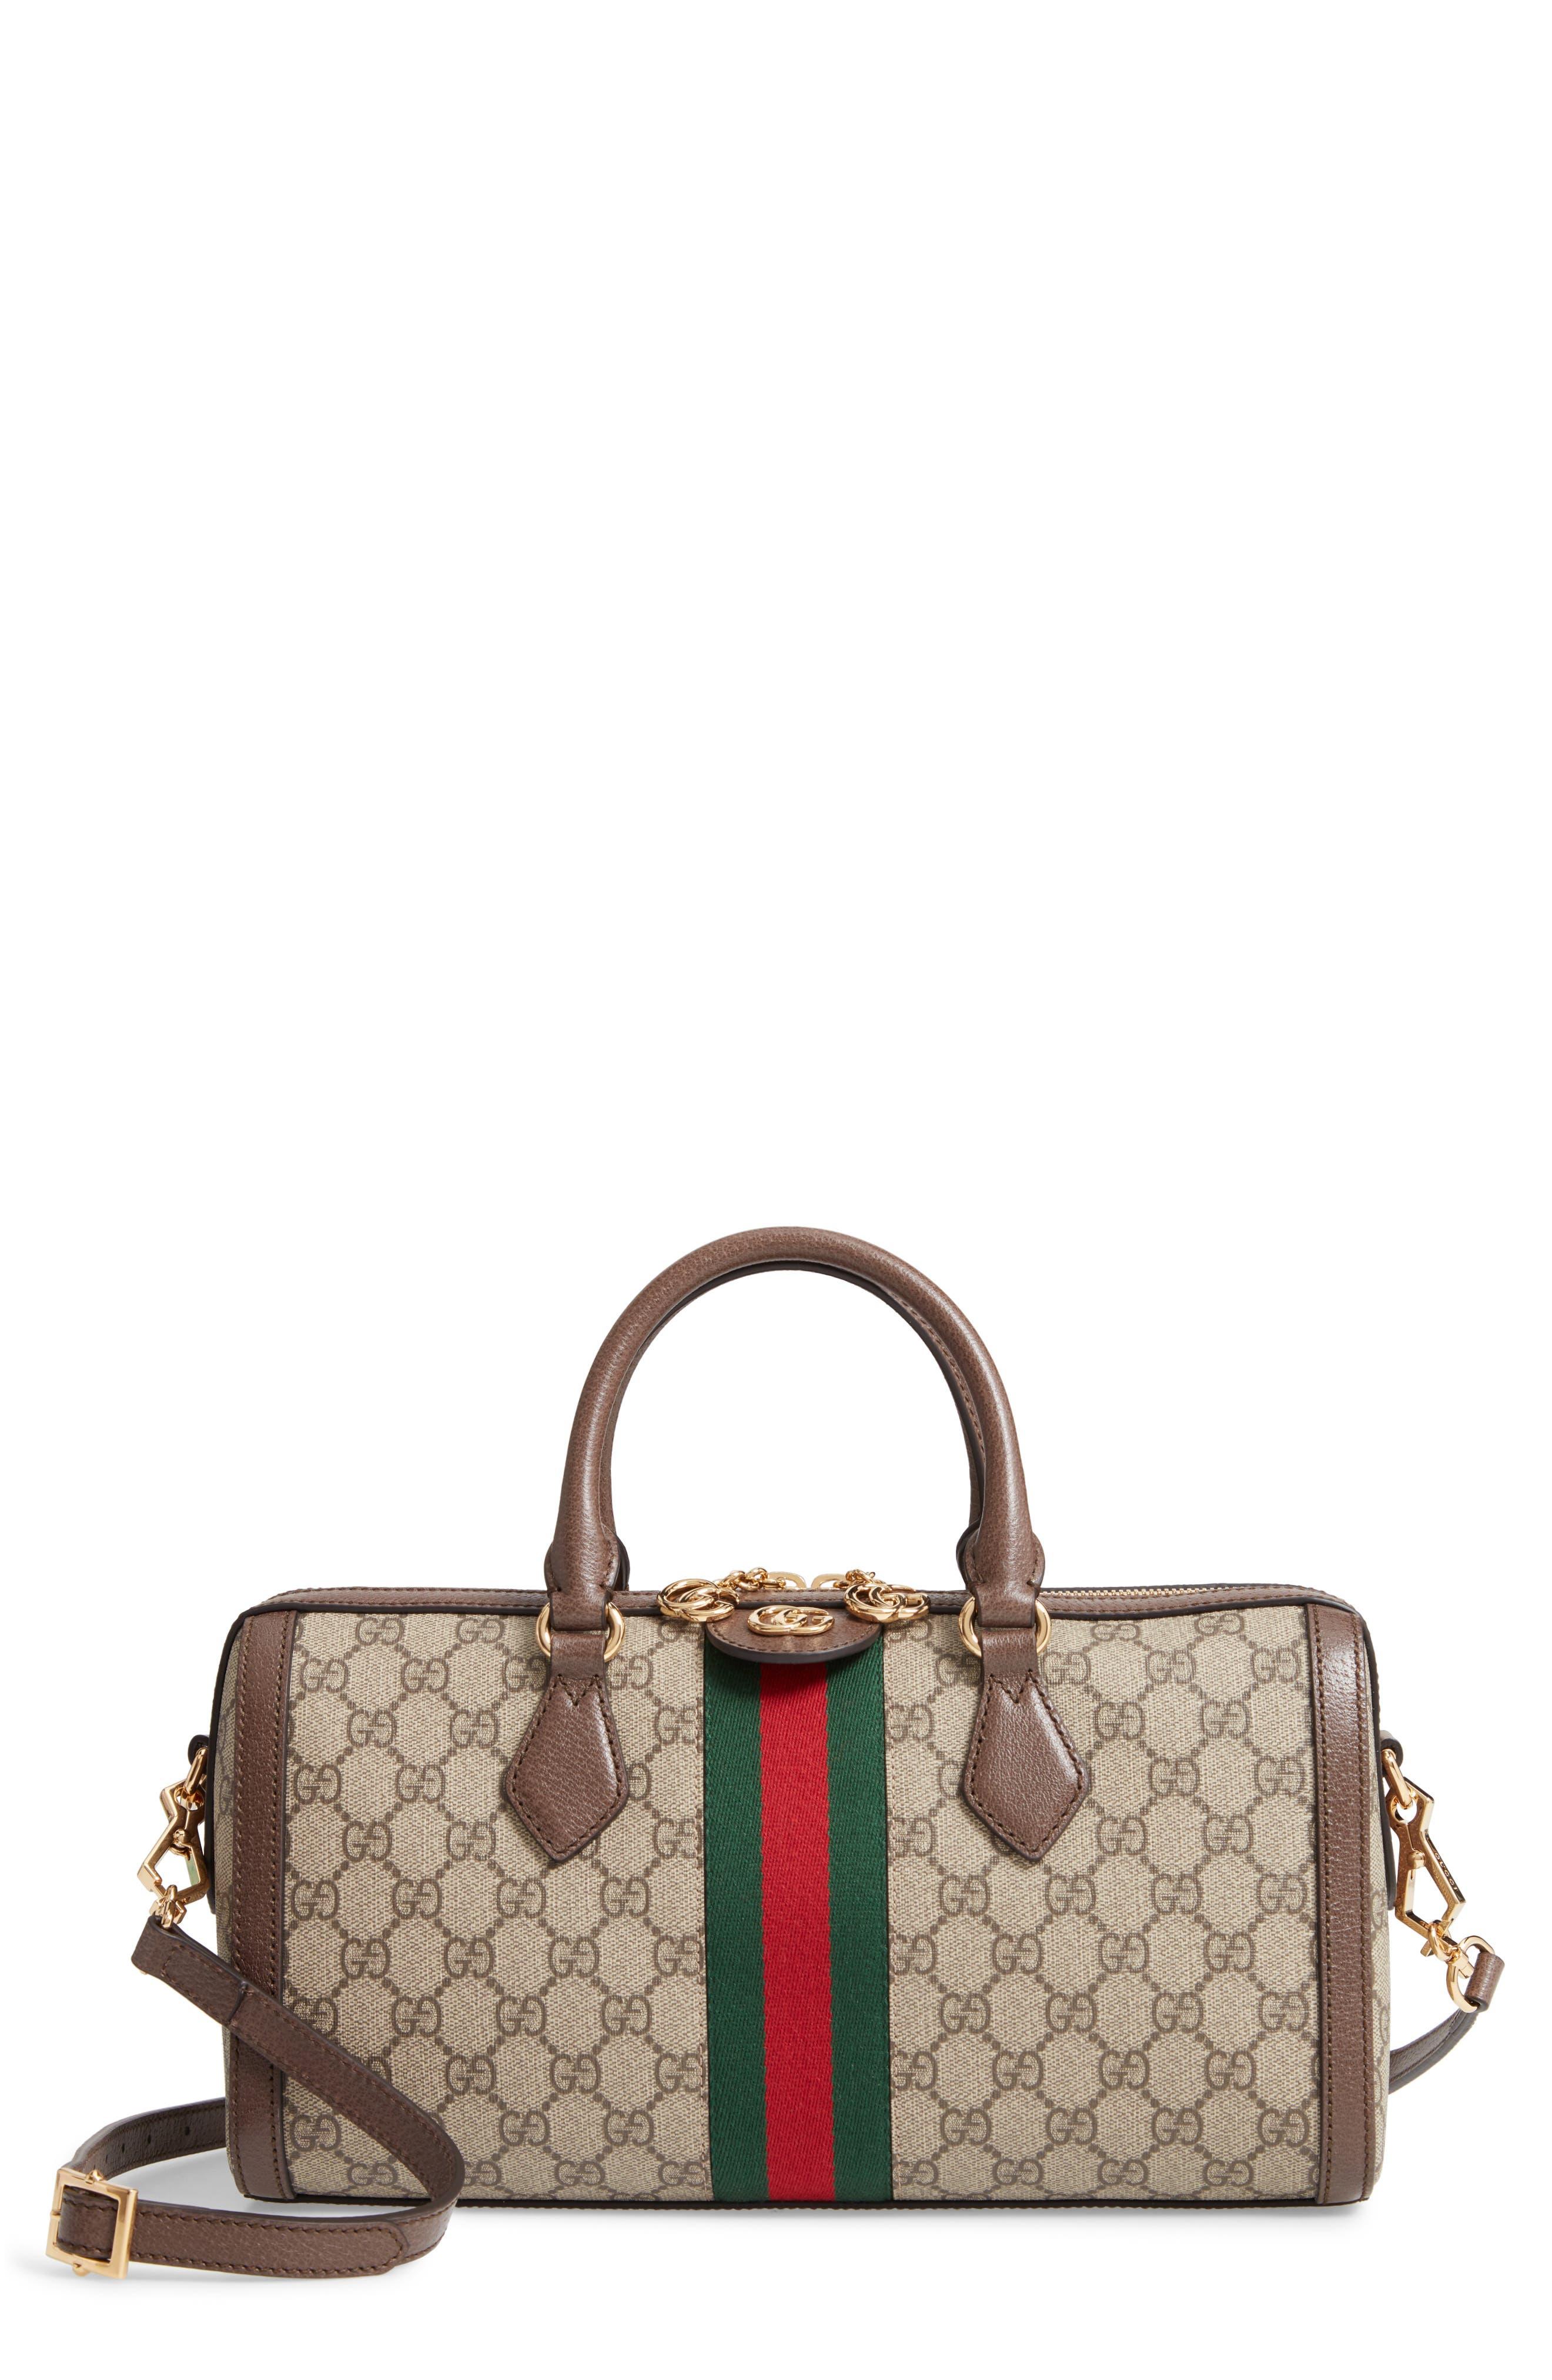 Ophidia GG Supreme Canvas Top Handle Bag,                         Main,                         color, BEIGE EBONY/ ACERO/ VERT RED